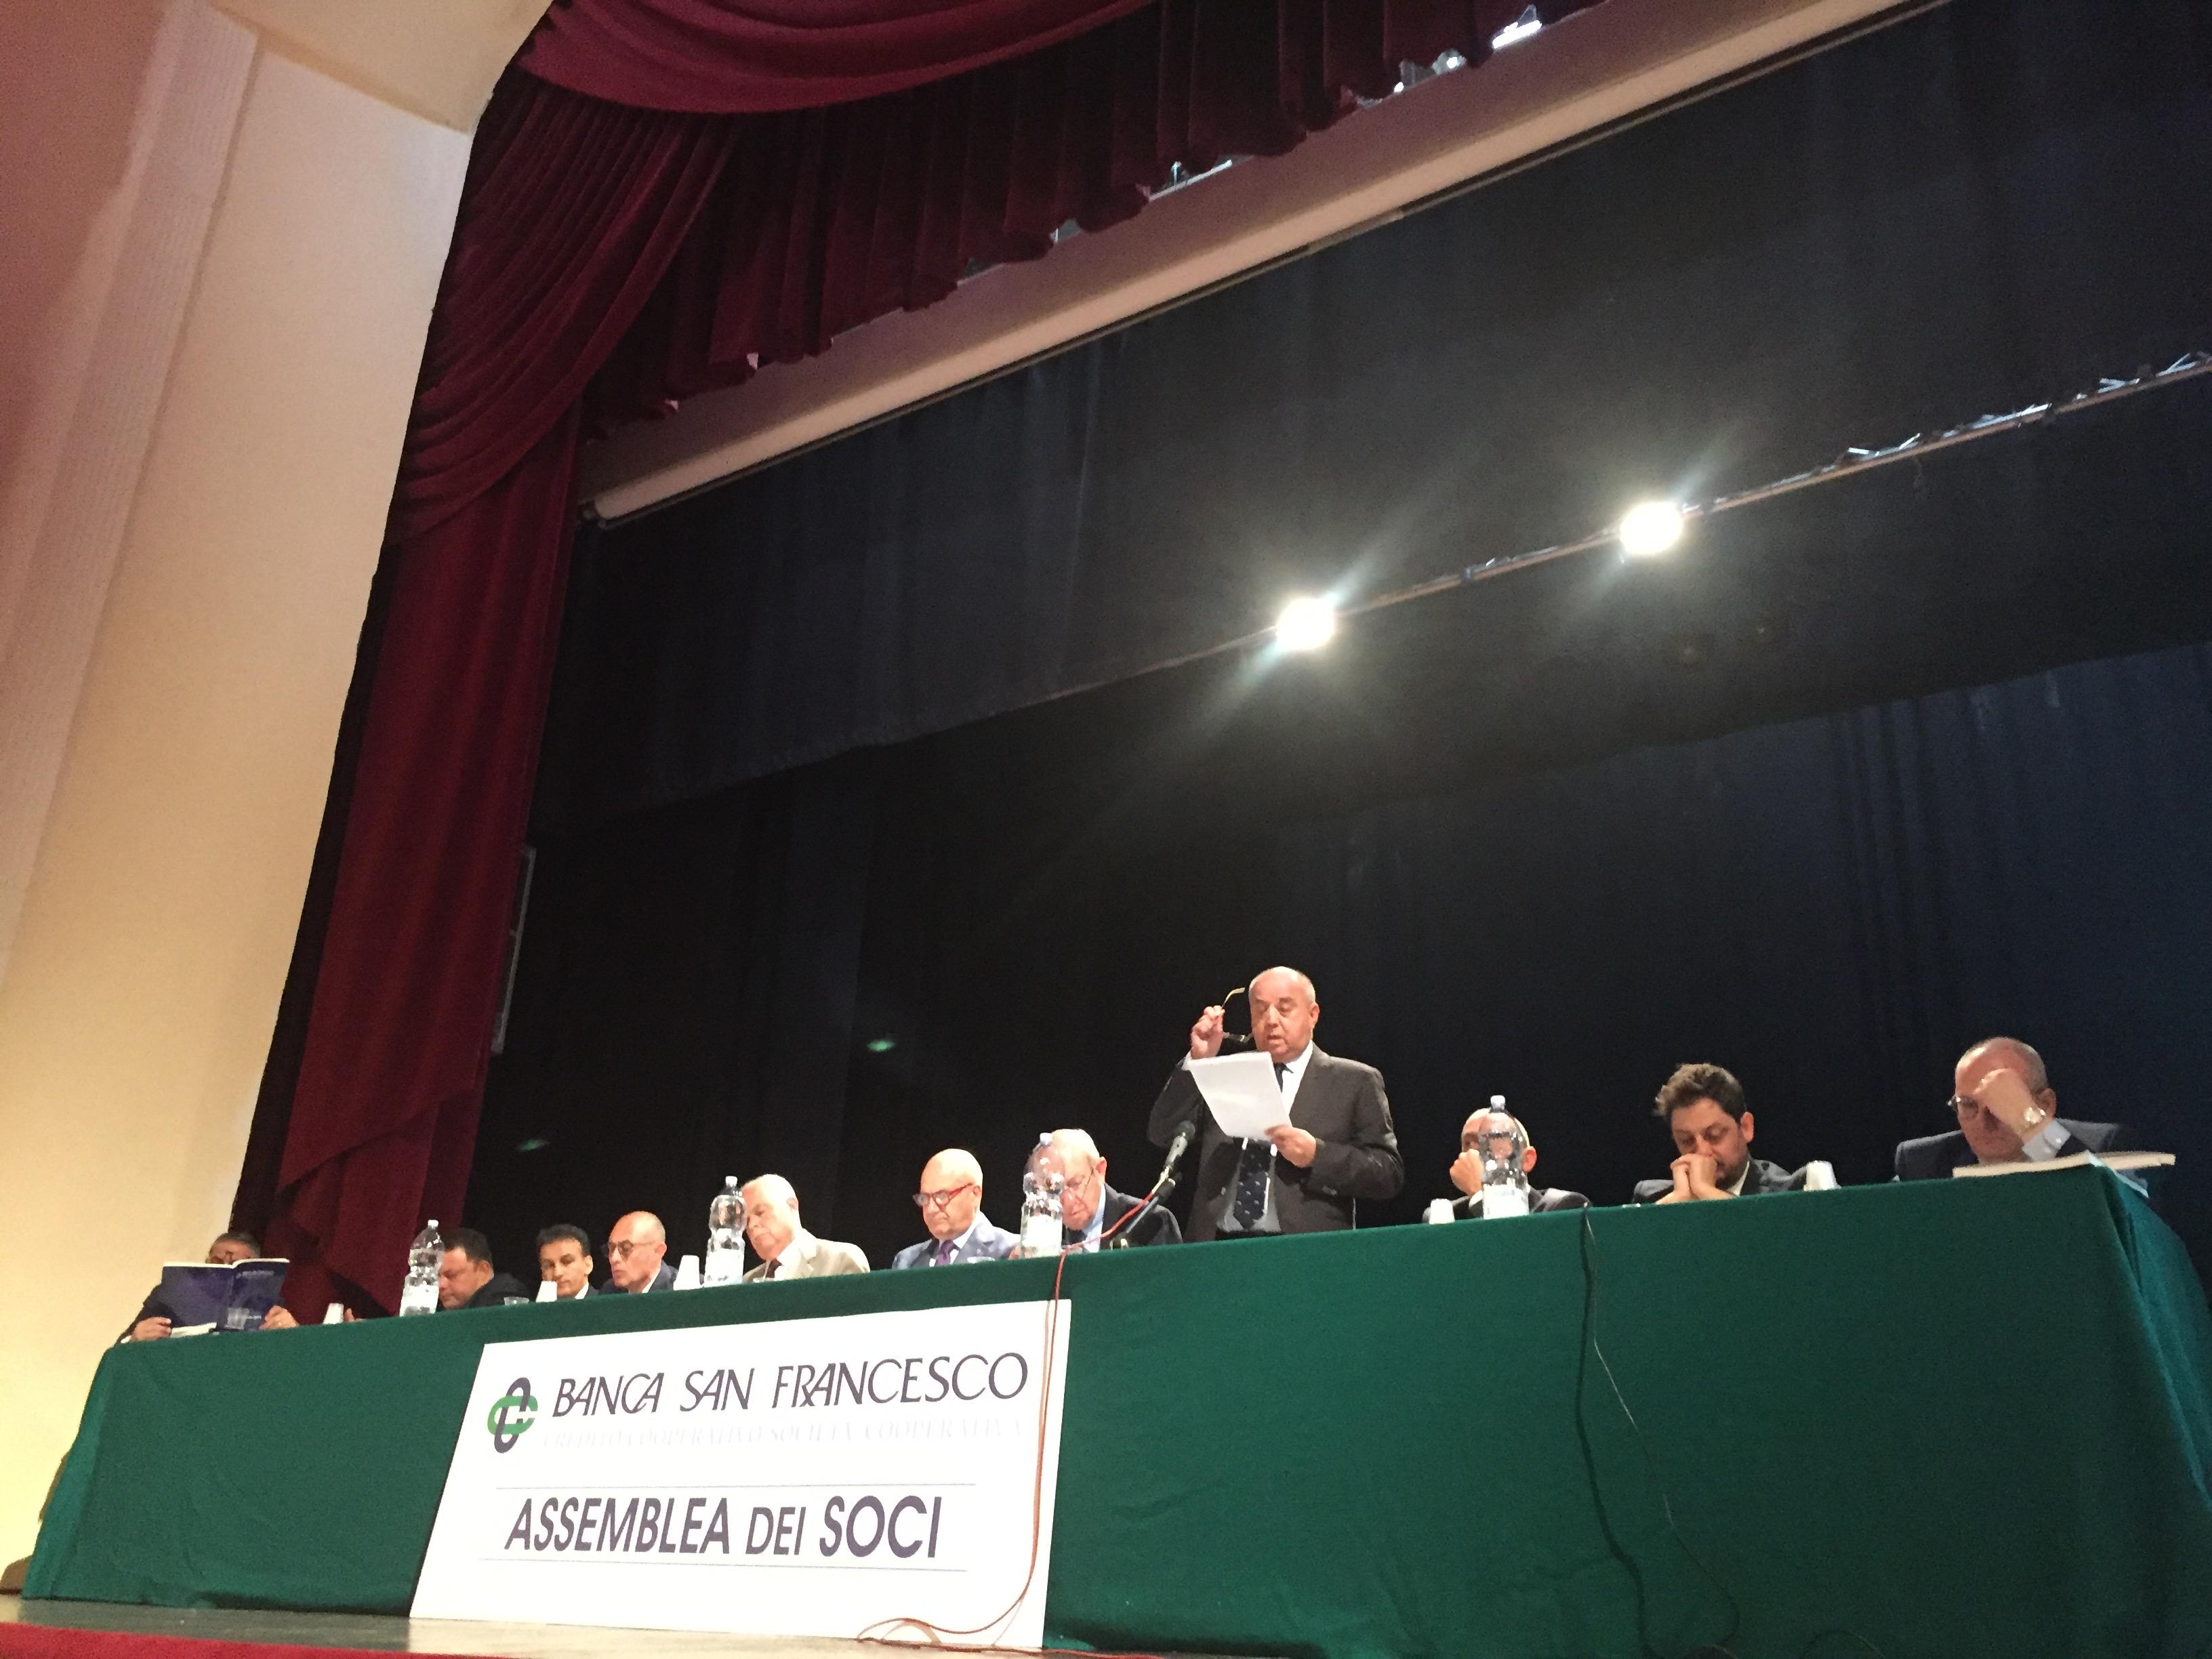 Banca San Francesco. Assemblea approva 15 transazioni per azione responsabilità ex amministratori